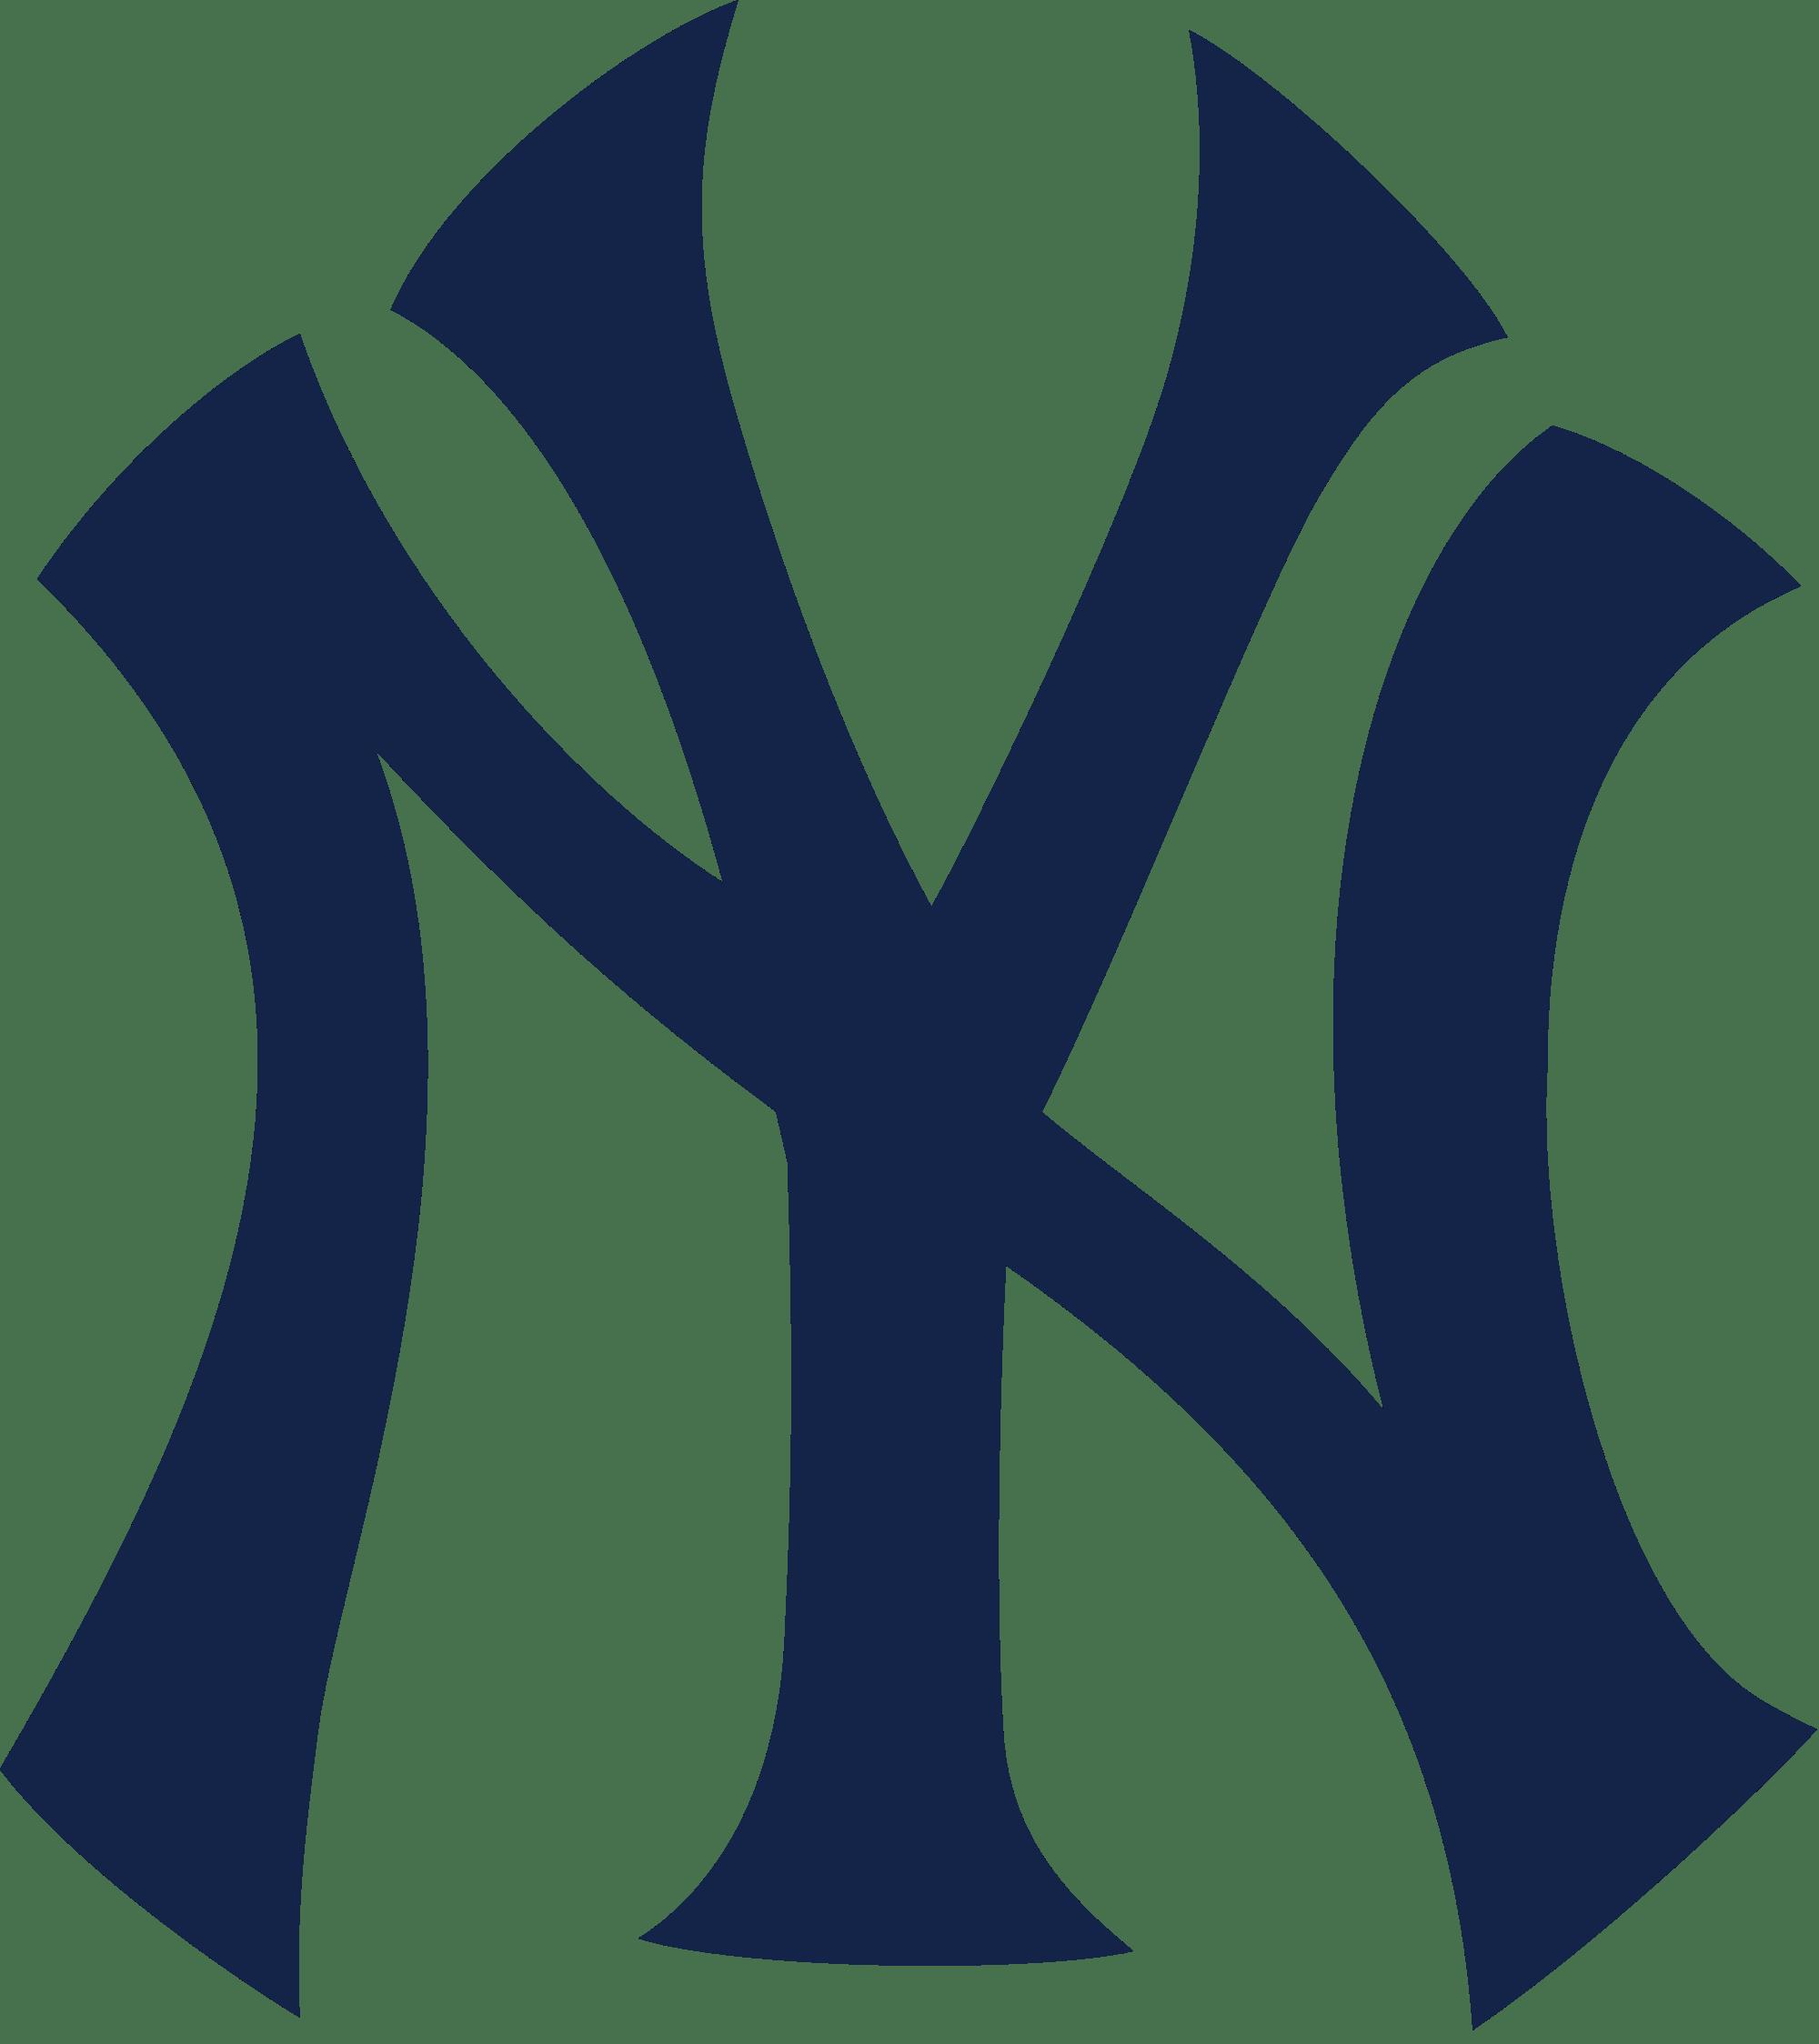 new york yankees logo ny transparent png stickpng new york yankees font dafont new york yankees font free download